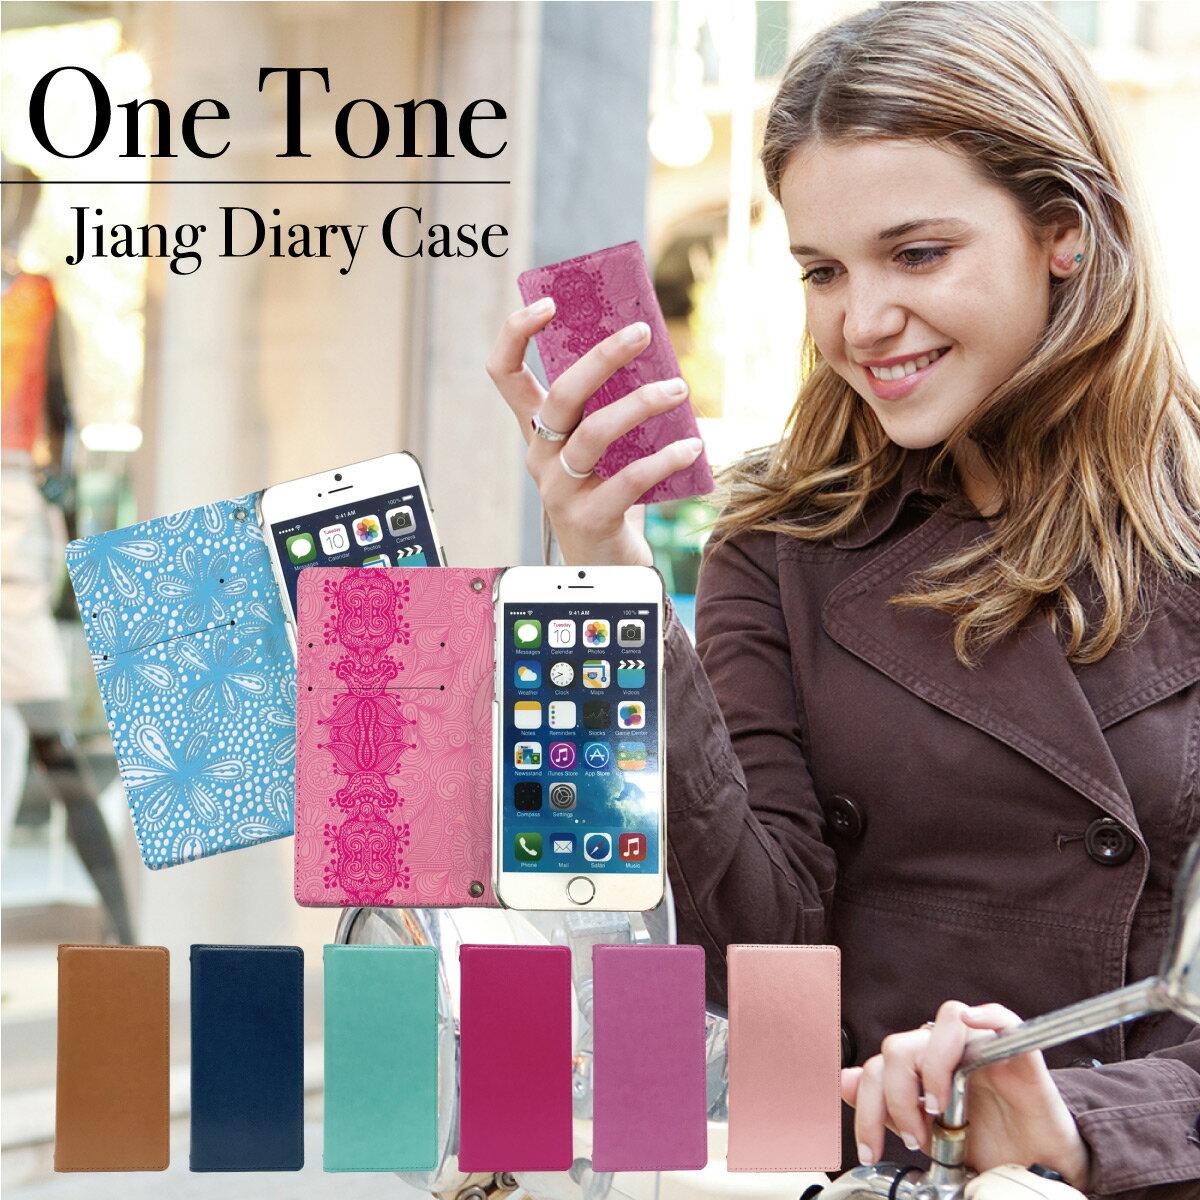 iPhoneケース iPhone7ケース iPhone7plus ケース スマホケース 手帳型 全機種対応 ベルトなし 手帳型ケース アイフォン7 ケース 可愛い カバー 送料無料 iPhone7 iPhone6s iPhone6 Plus Xperia XZ SO-02J aquos phone arrows レース柄 jiang-ds805